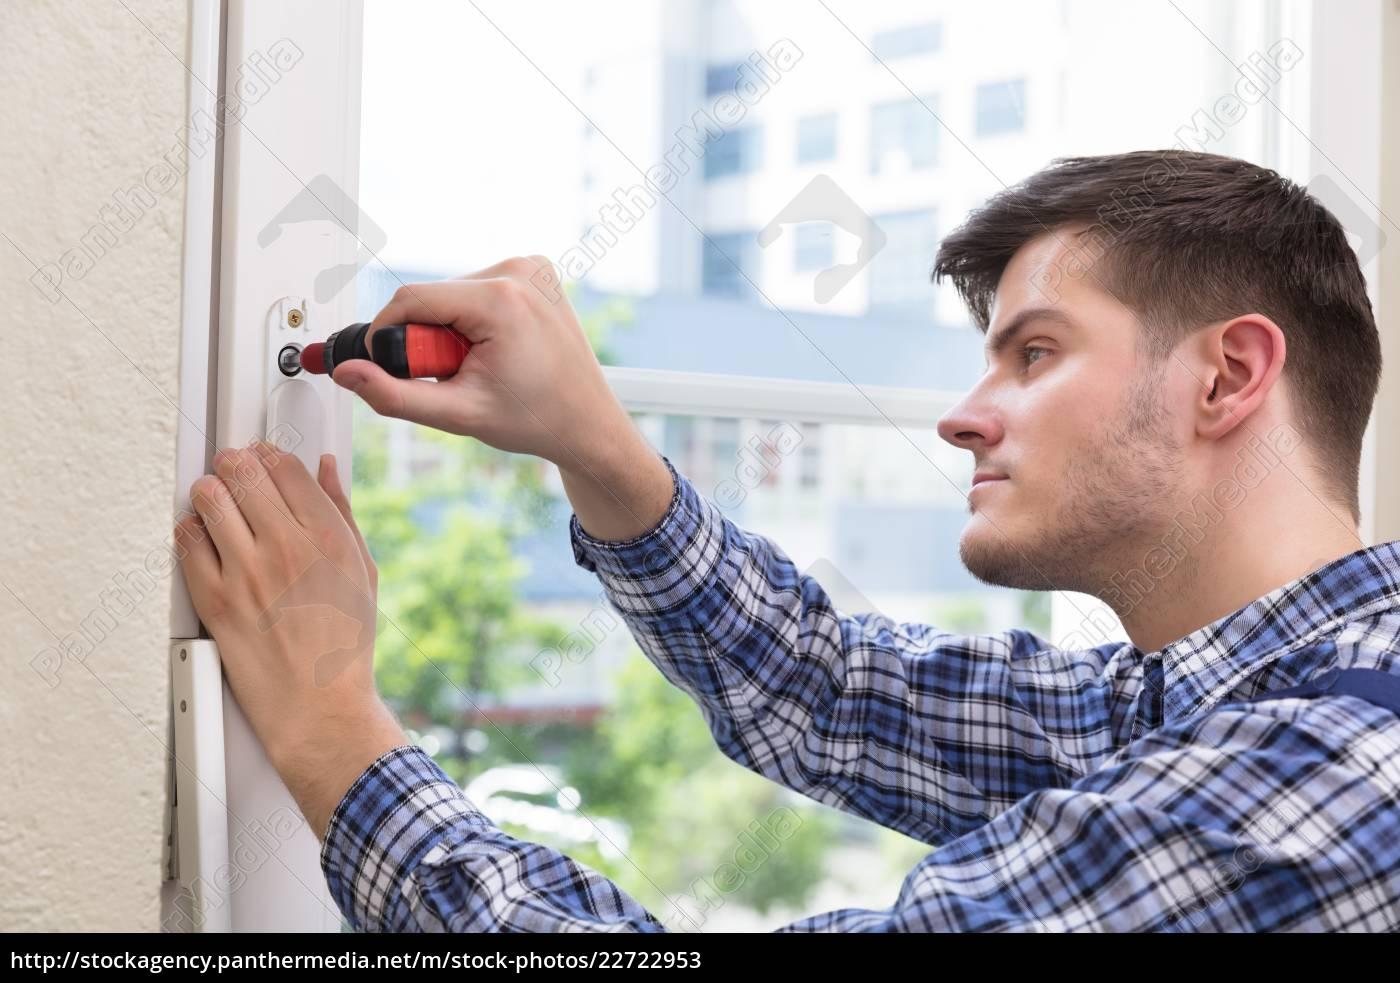 handyman, fixing, window, with, screwdriver - 22722953